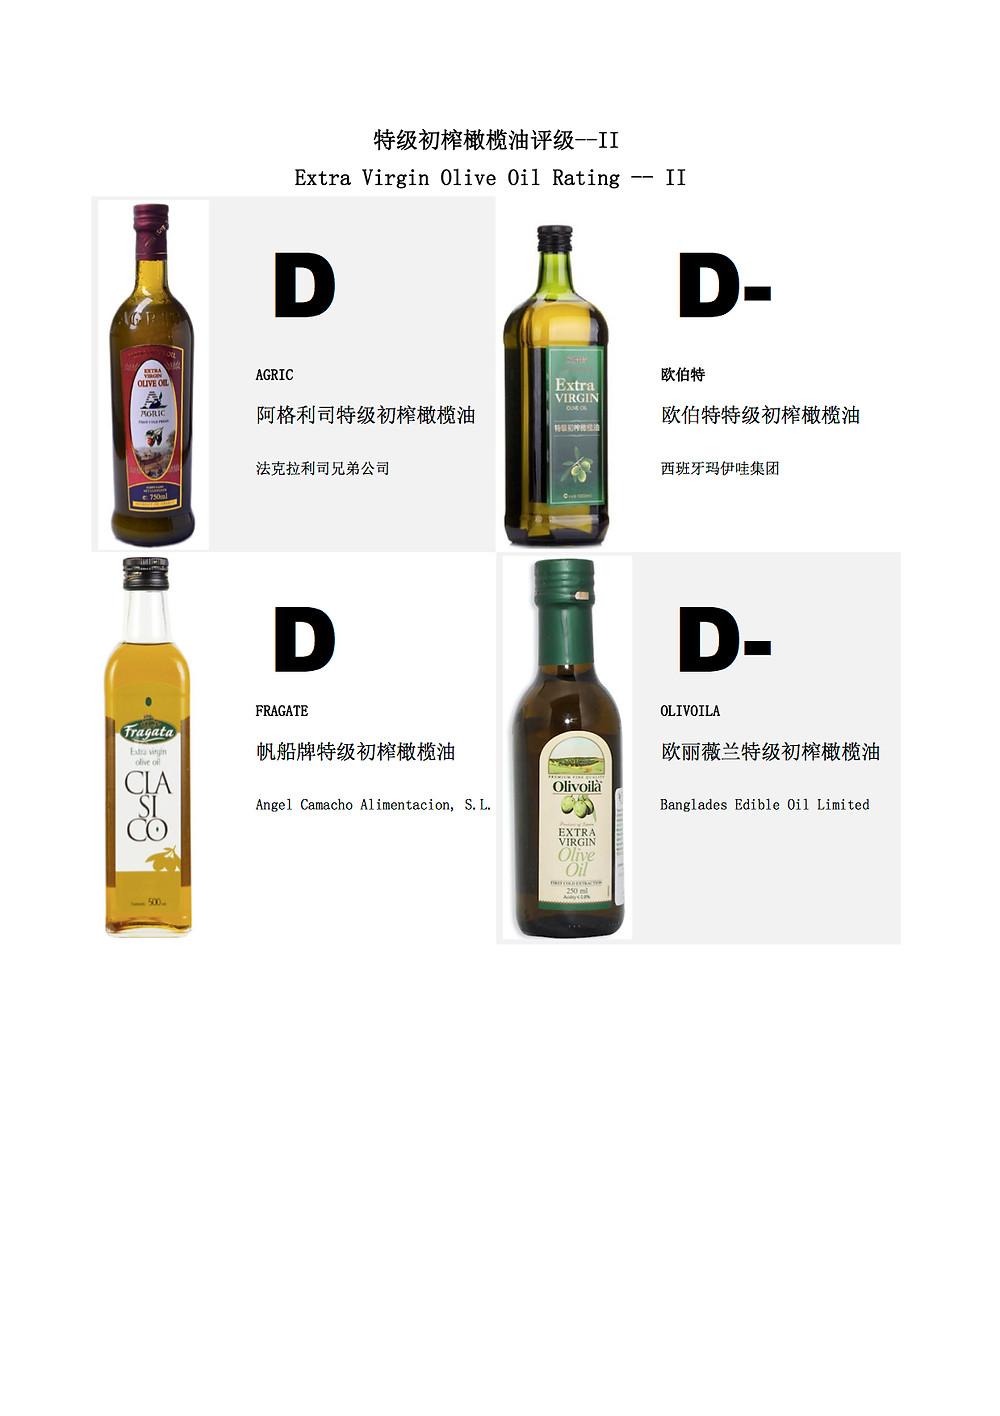 Extra Virgin Olive Oil Rating II - Okoer Report